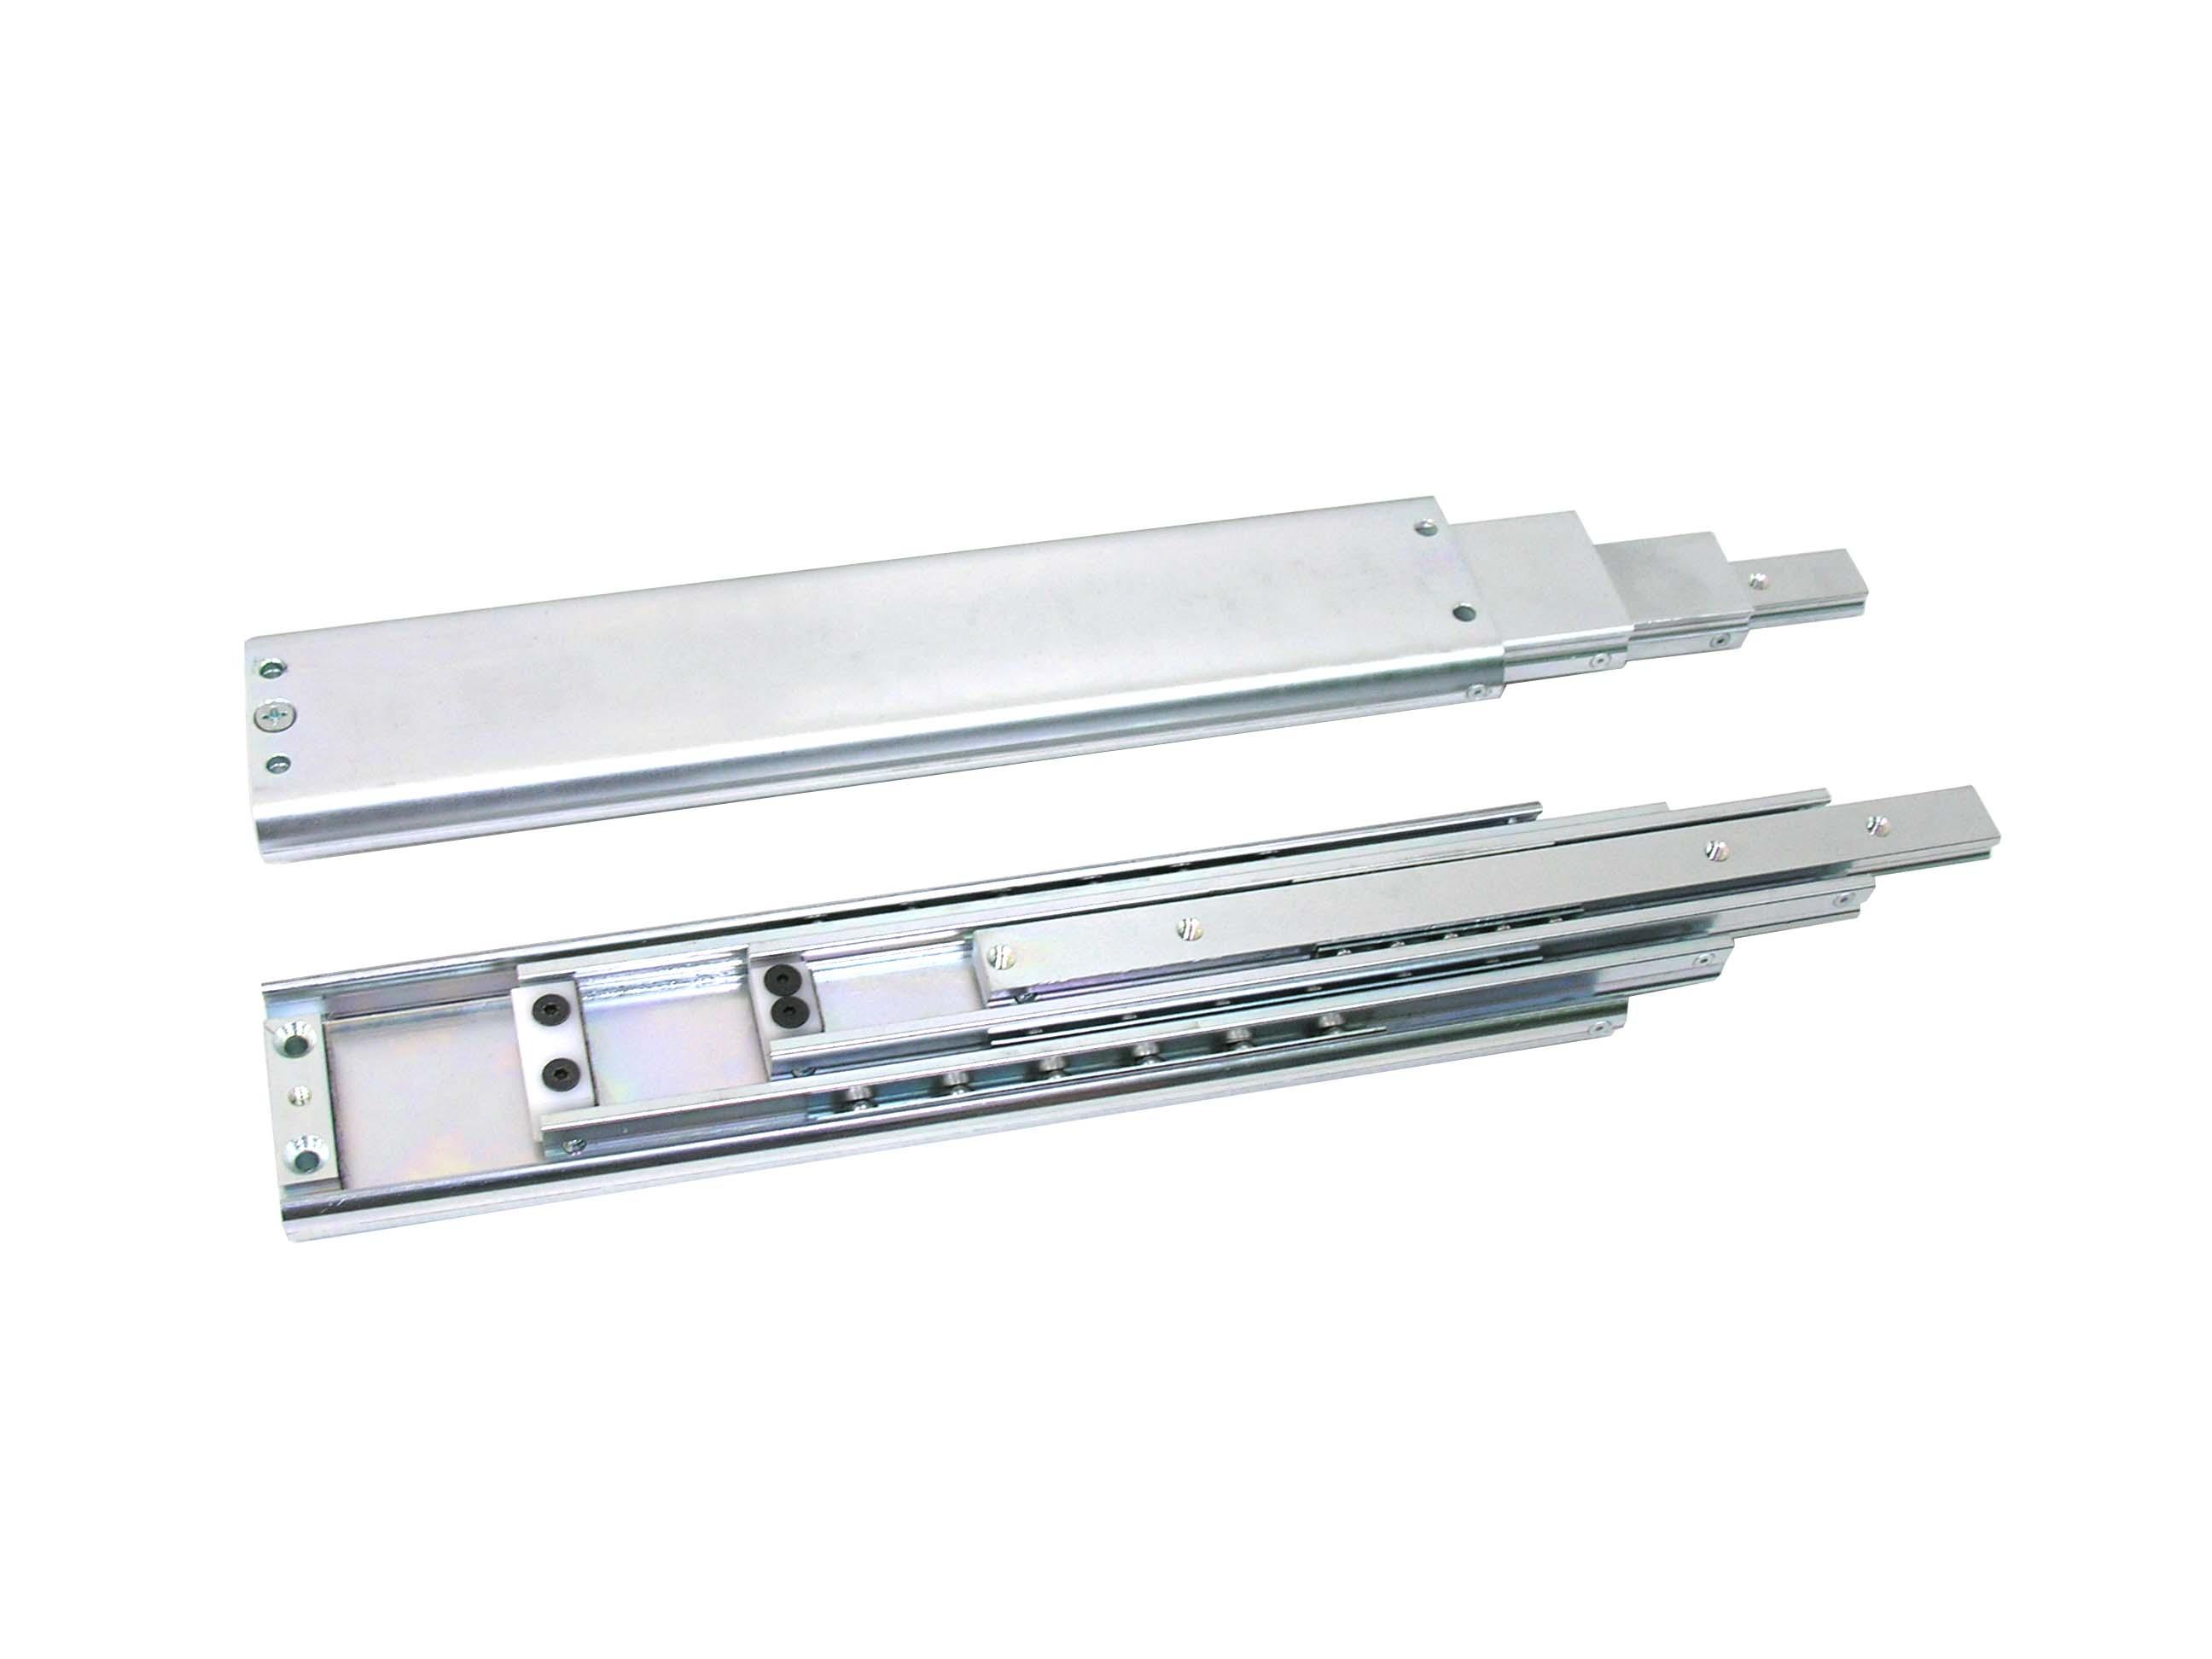 telescopic linear ball bearing rail